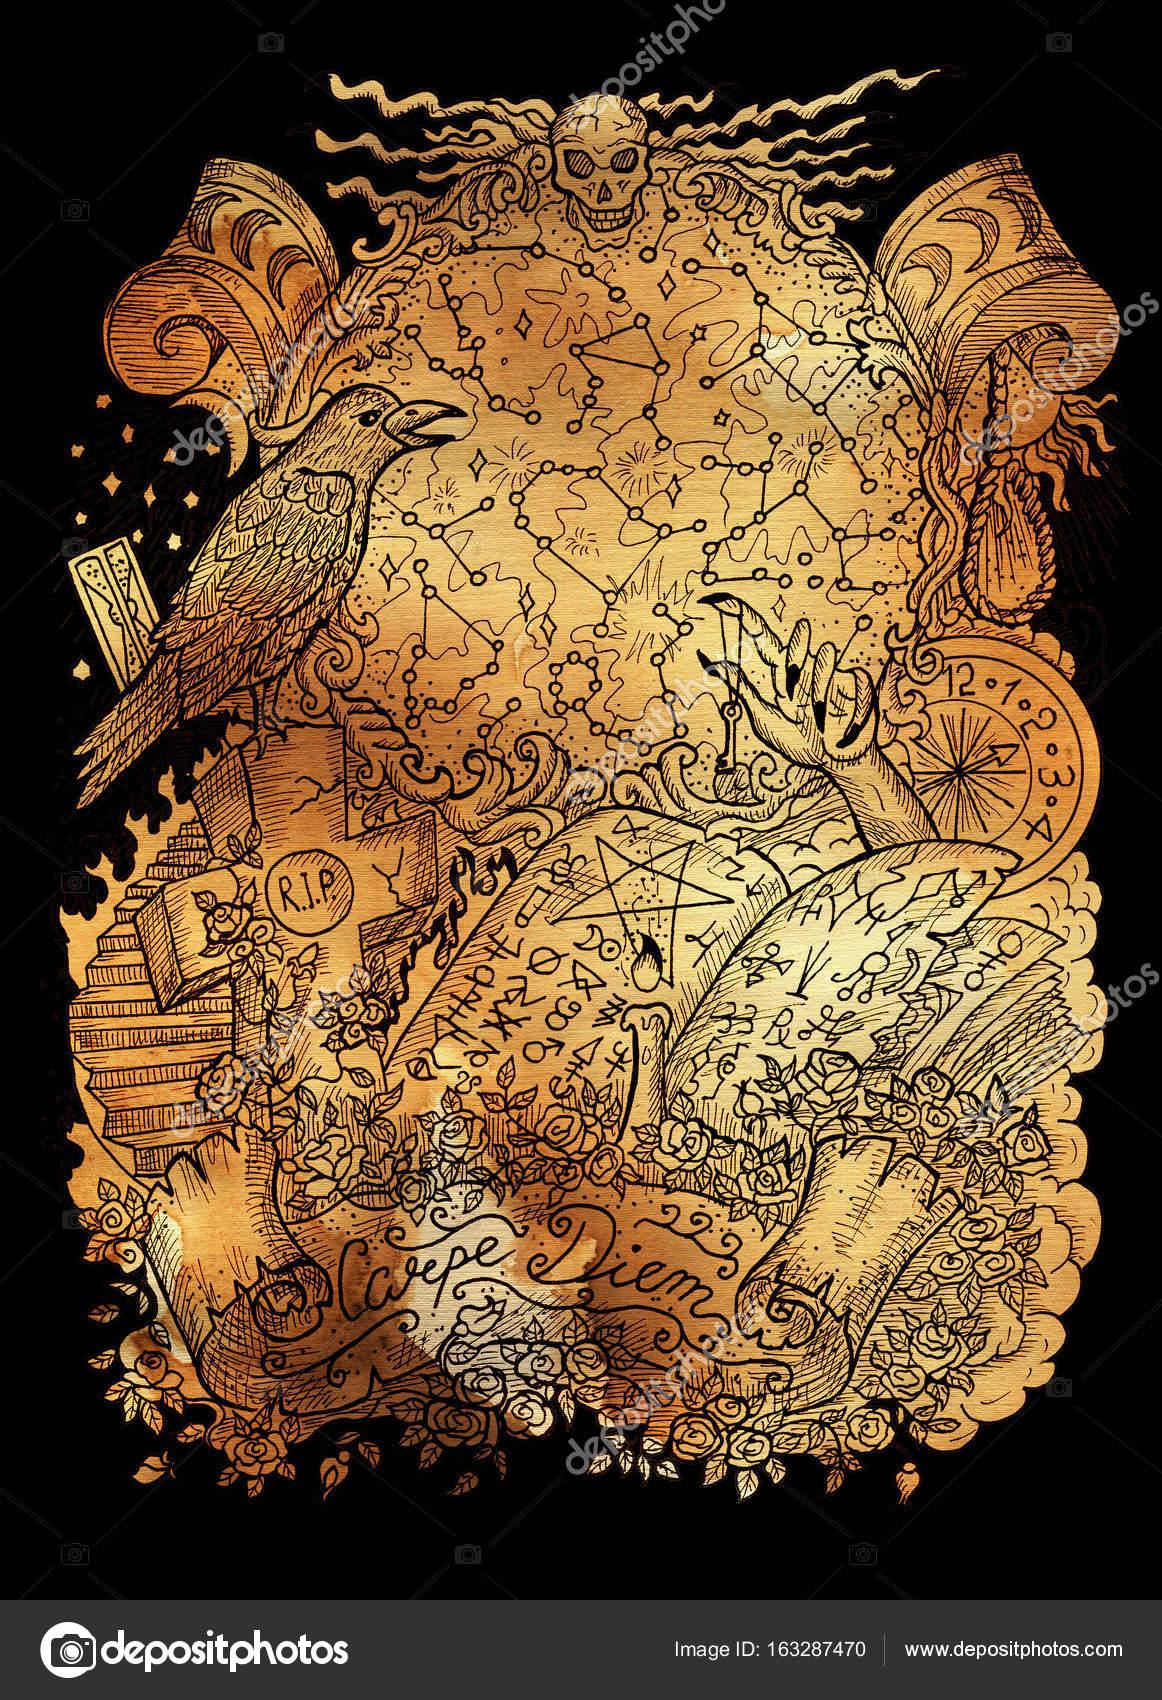 Mystic illustration with magic book, crow, warlock hand, zodiac